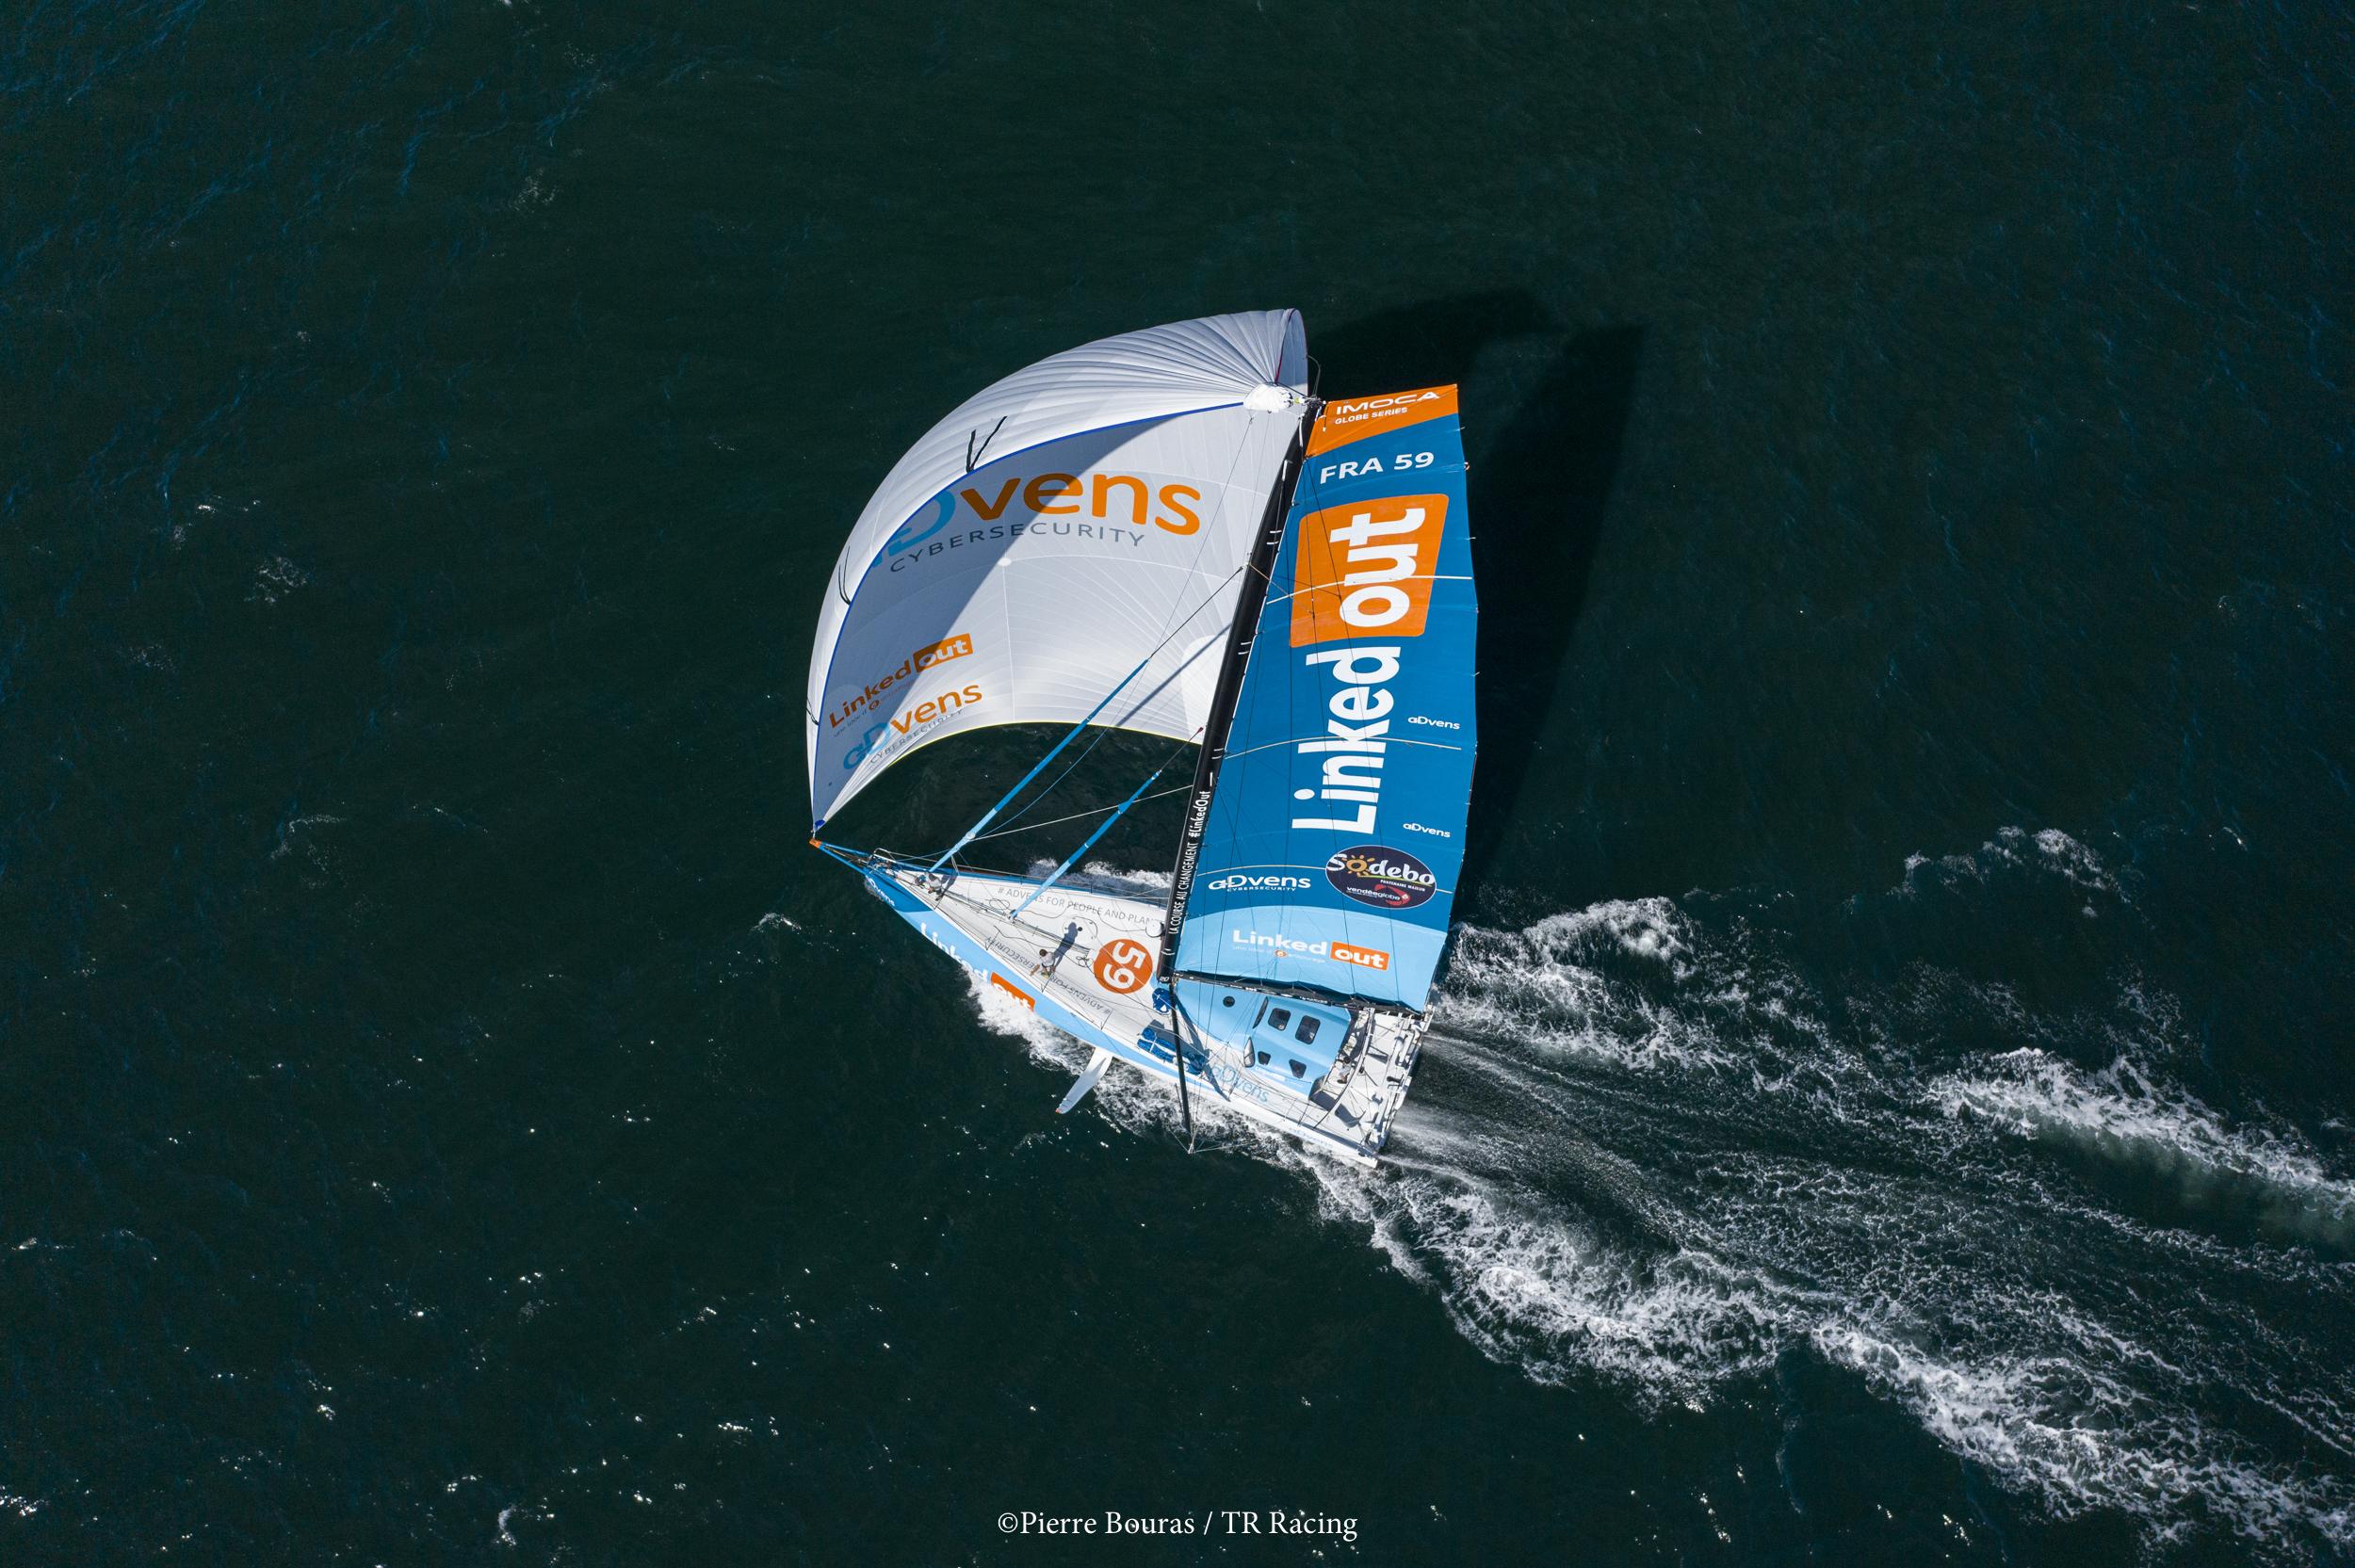 Thomas Ruyant toujours en tête - Fil infos - Vendée Globe - Voile